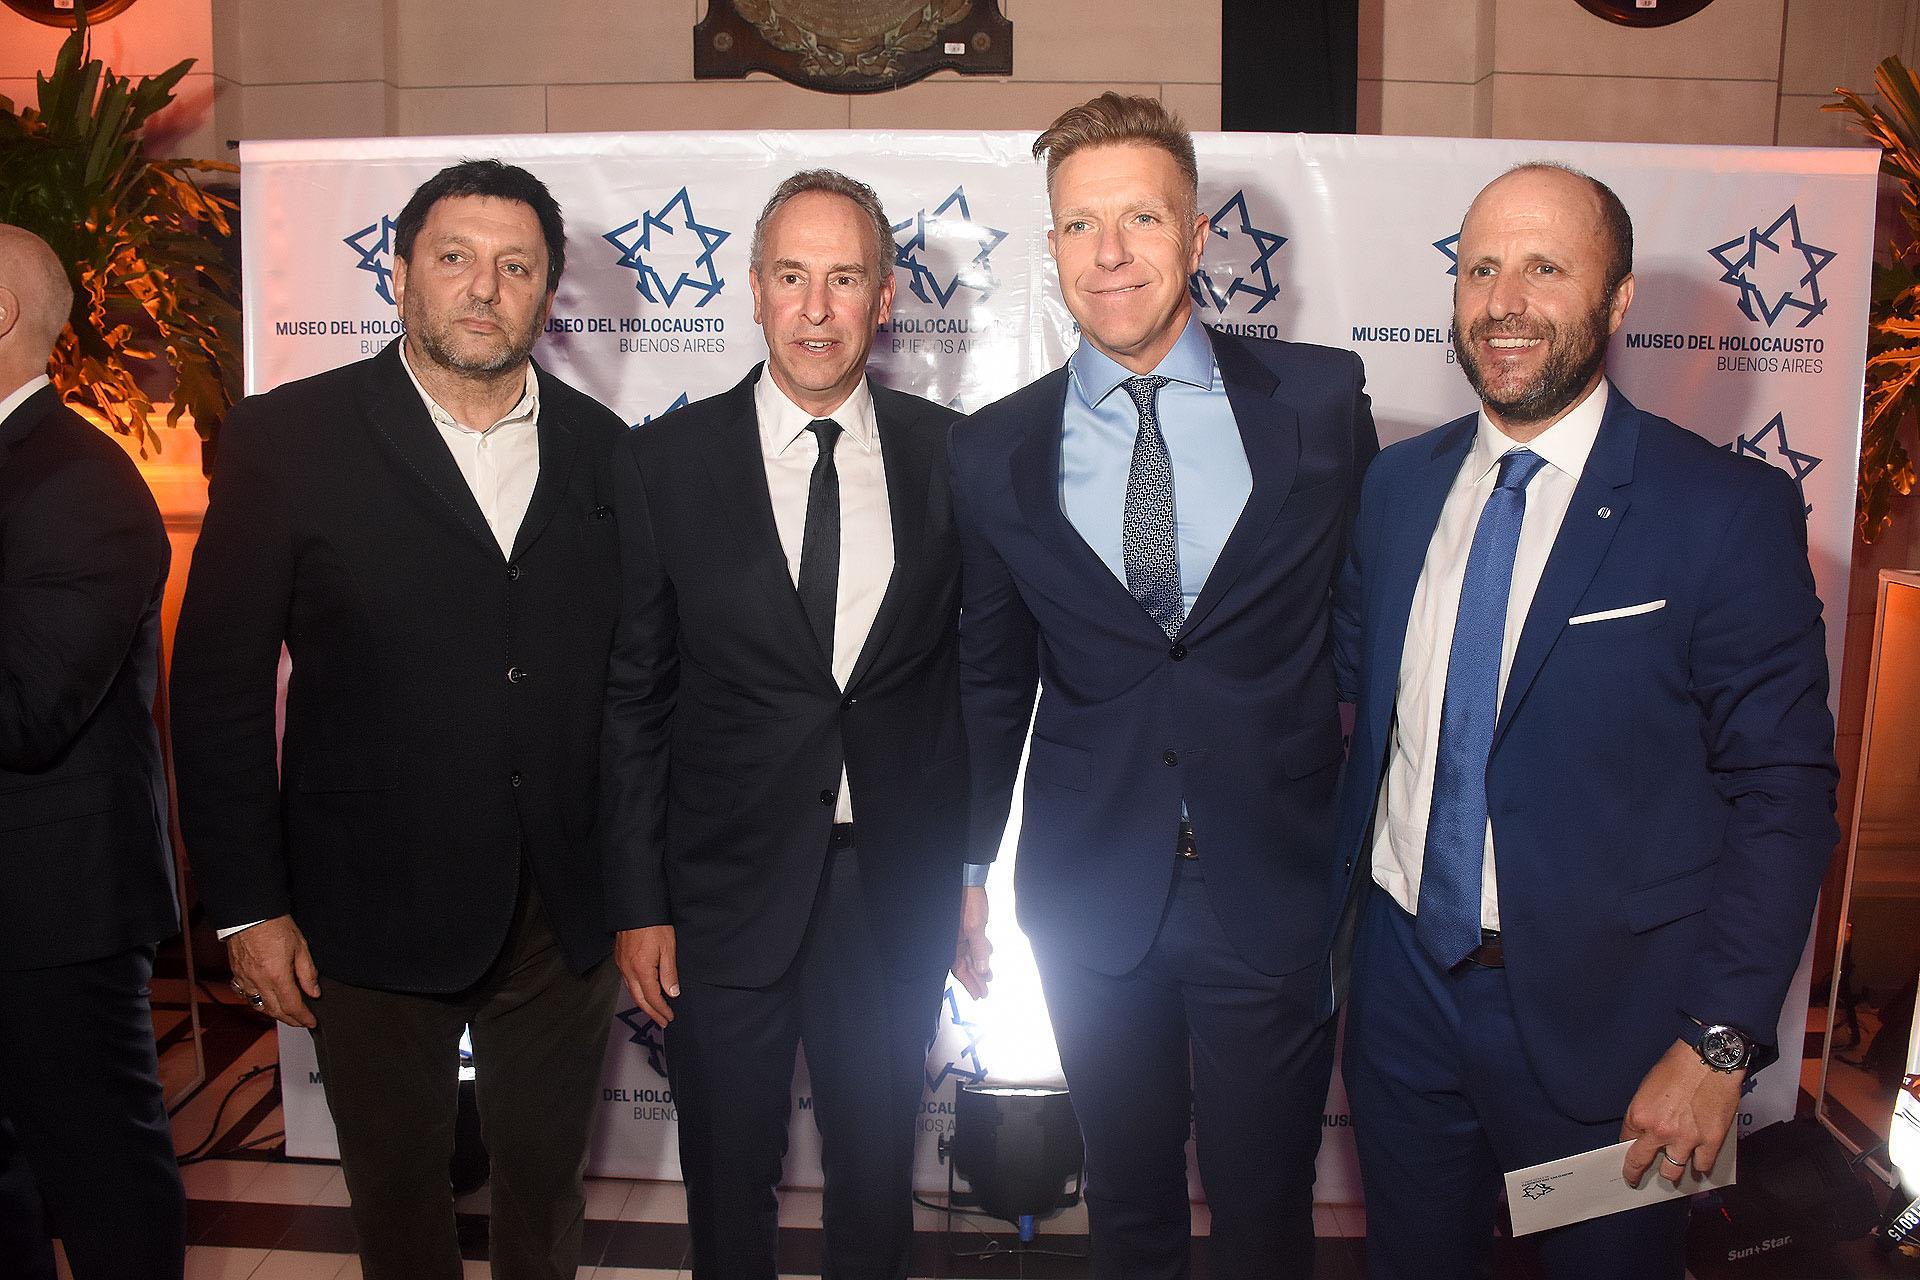 Gabriel Hochbaum, Marcelo Mindlin, Alejandro Fantino, y Mariano Borinsky